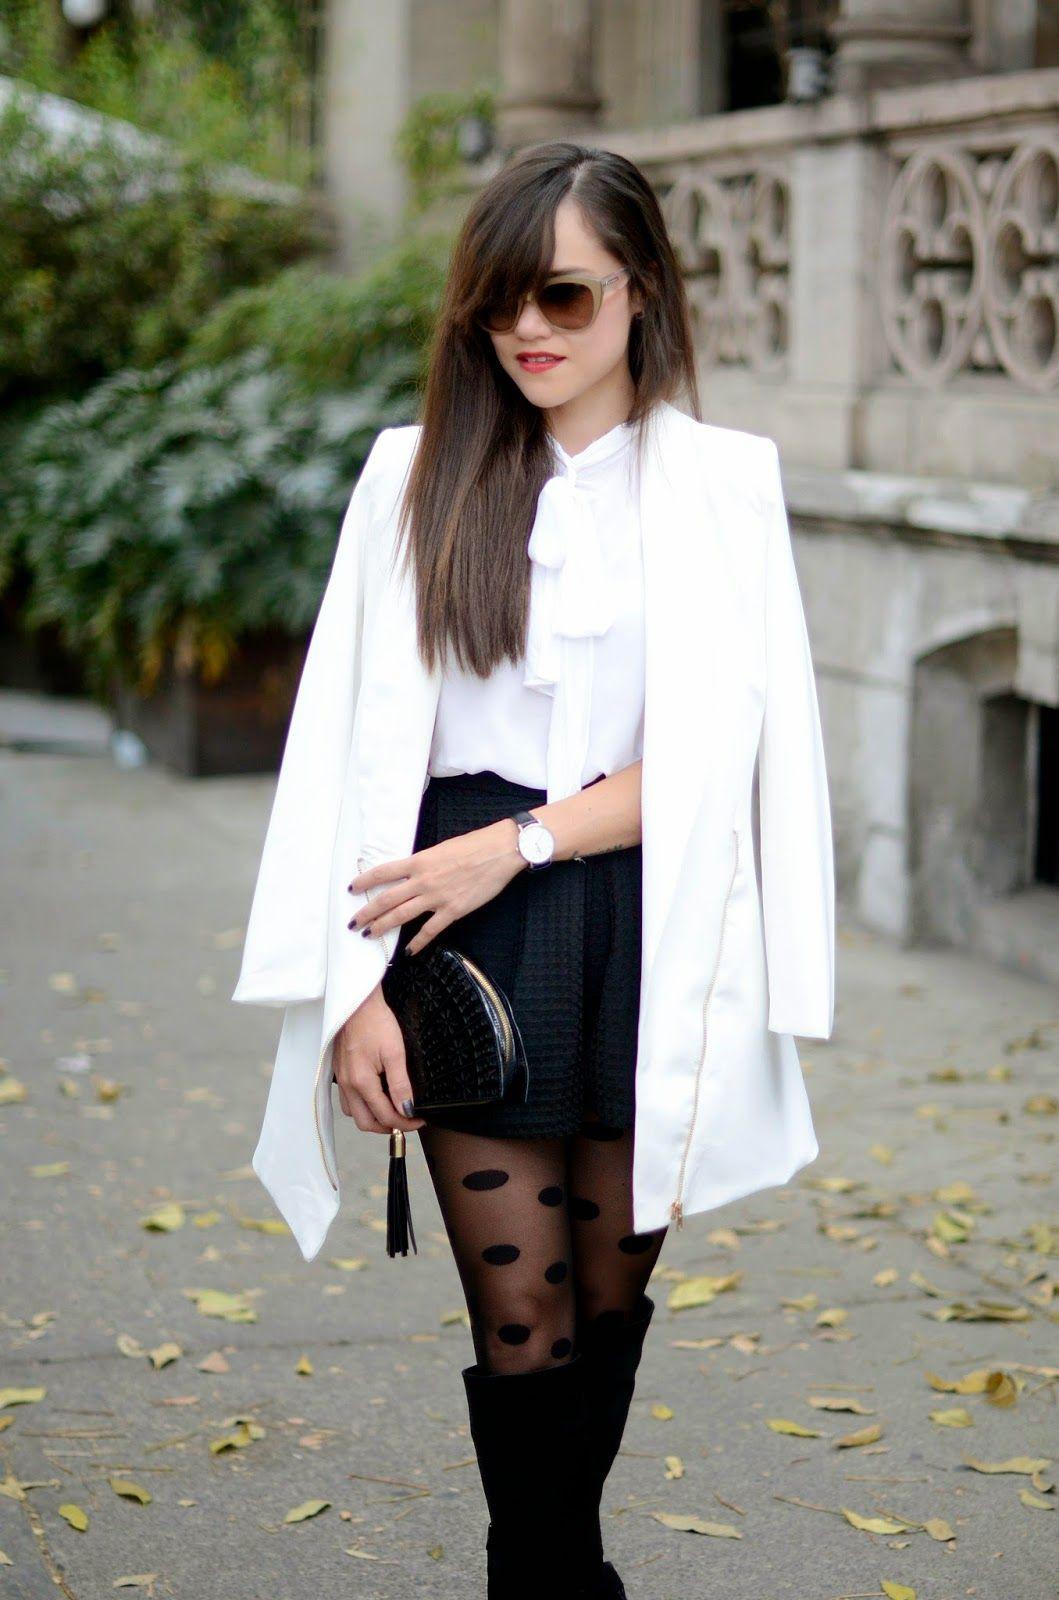 stylish Black Polka Dot Tights